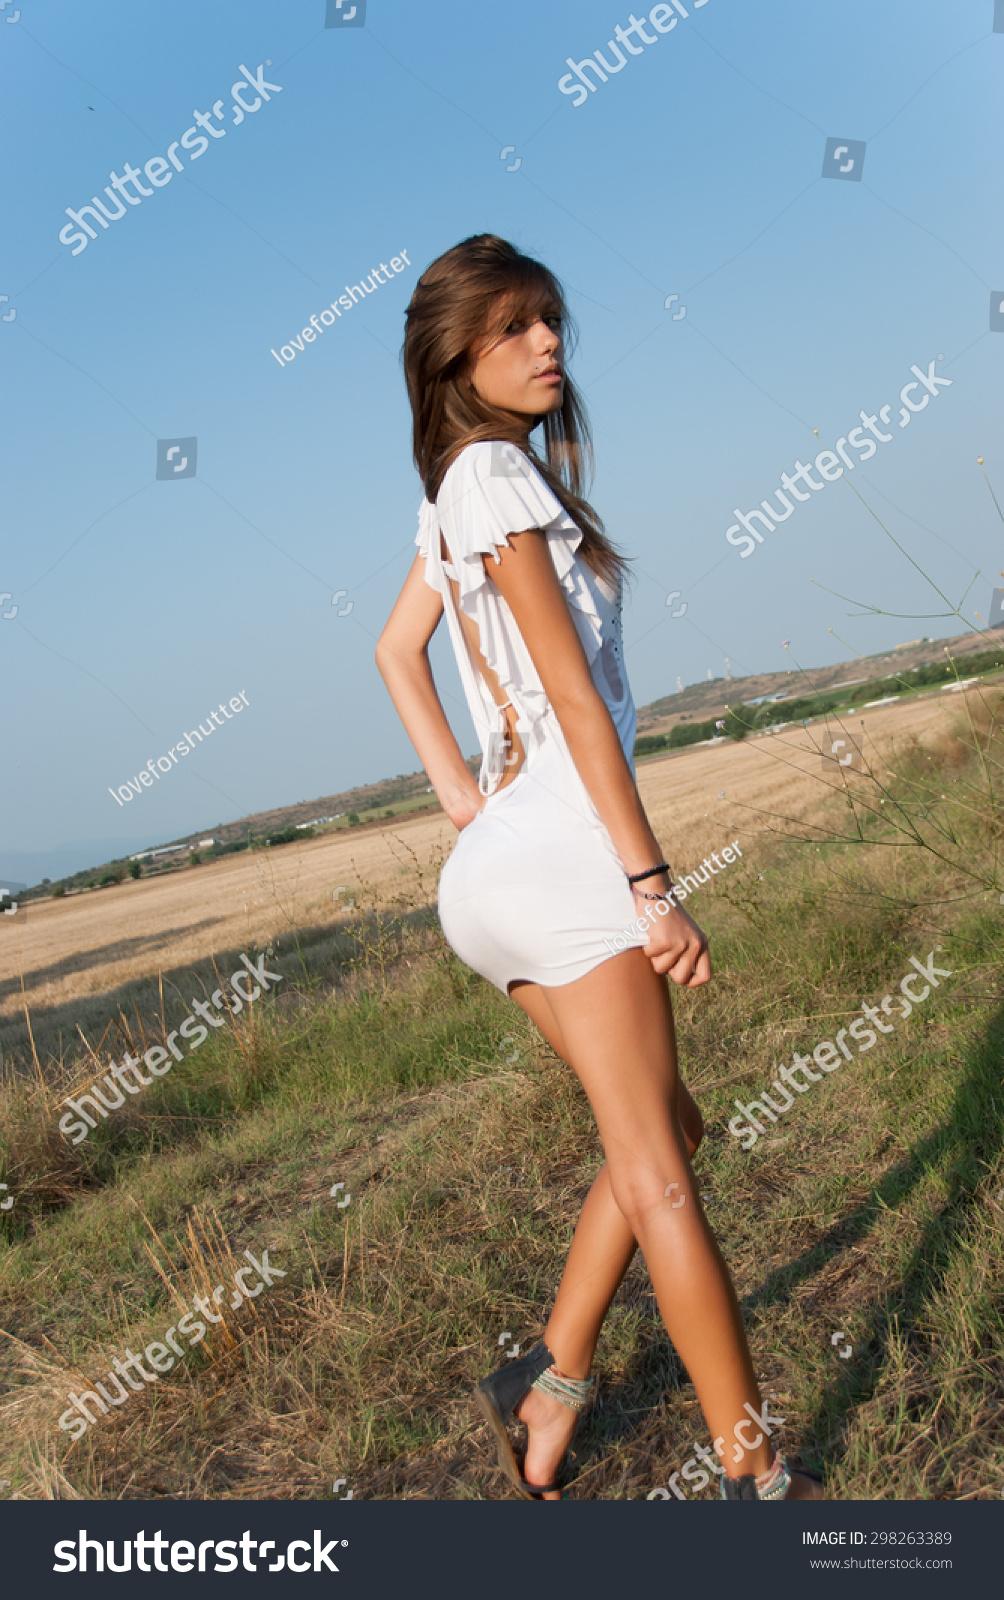 Teen Model Short Images Usseek Com